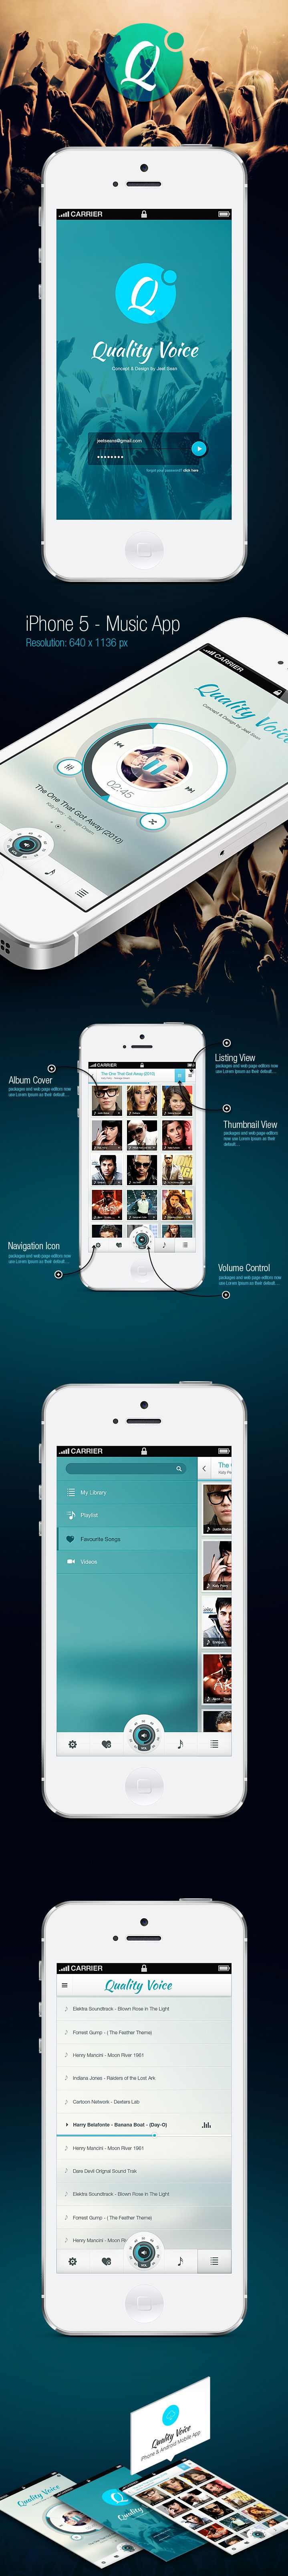 Quality Voice - Mobile App UI | #musicplayer